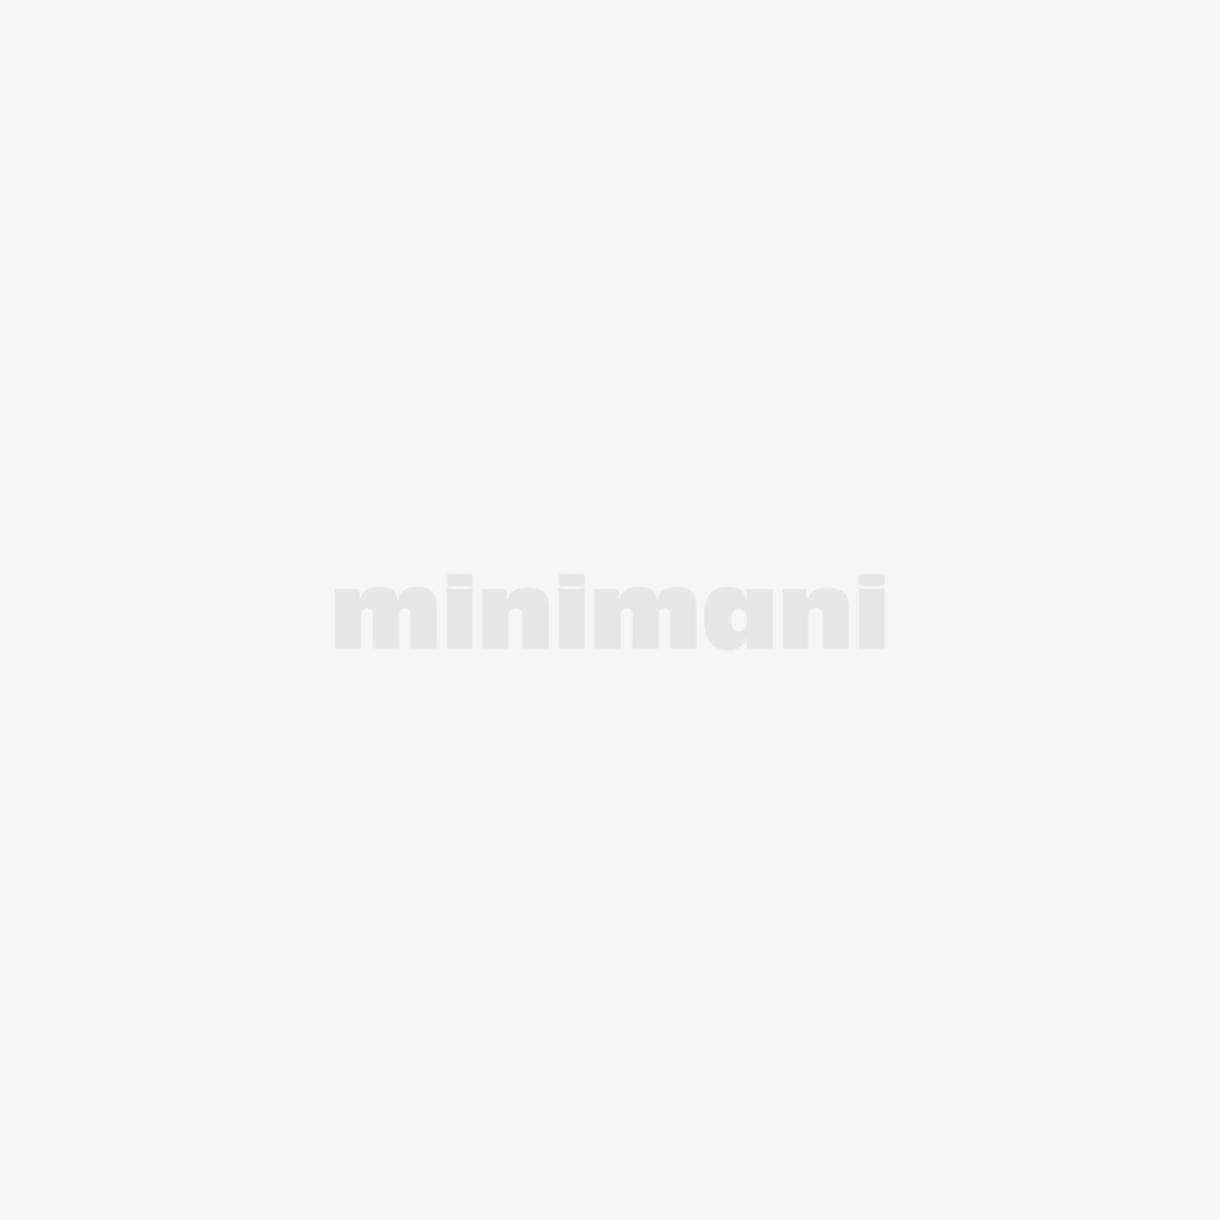 METALTEX FLORENZ SUORAHYLLY 2-OS